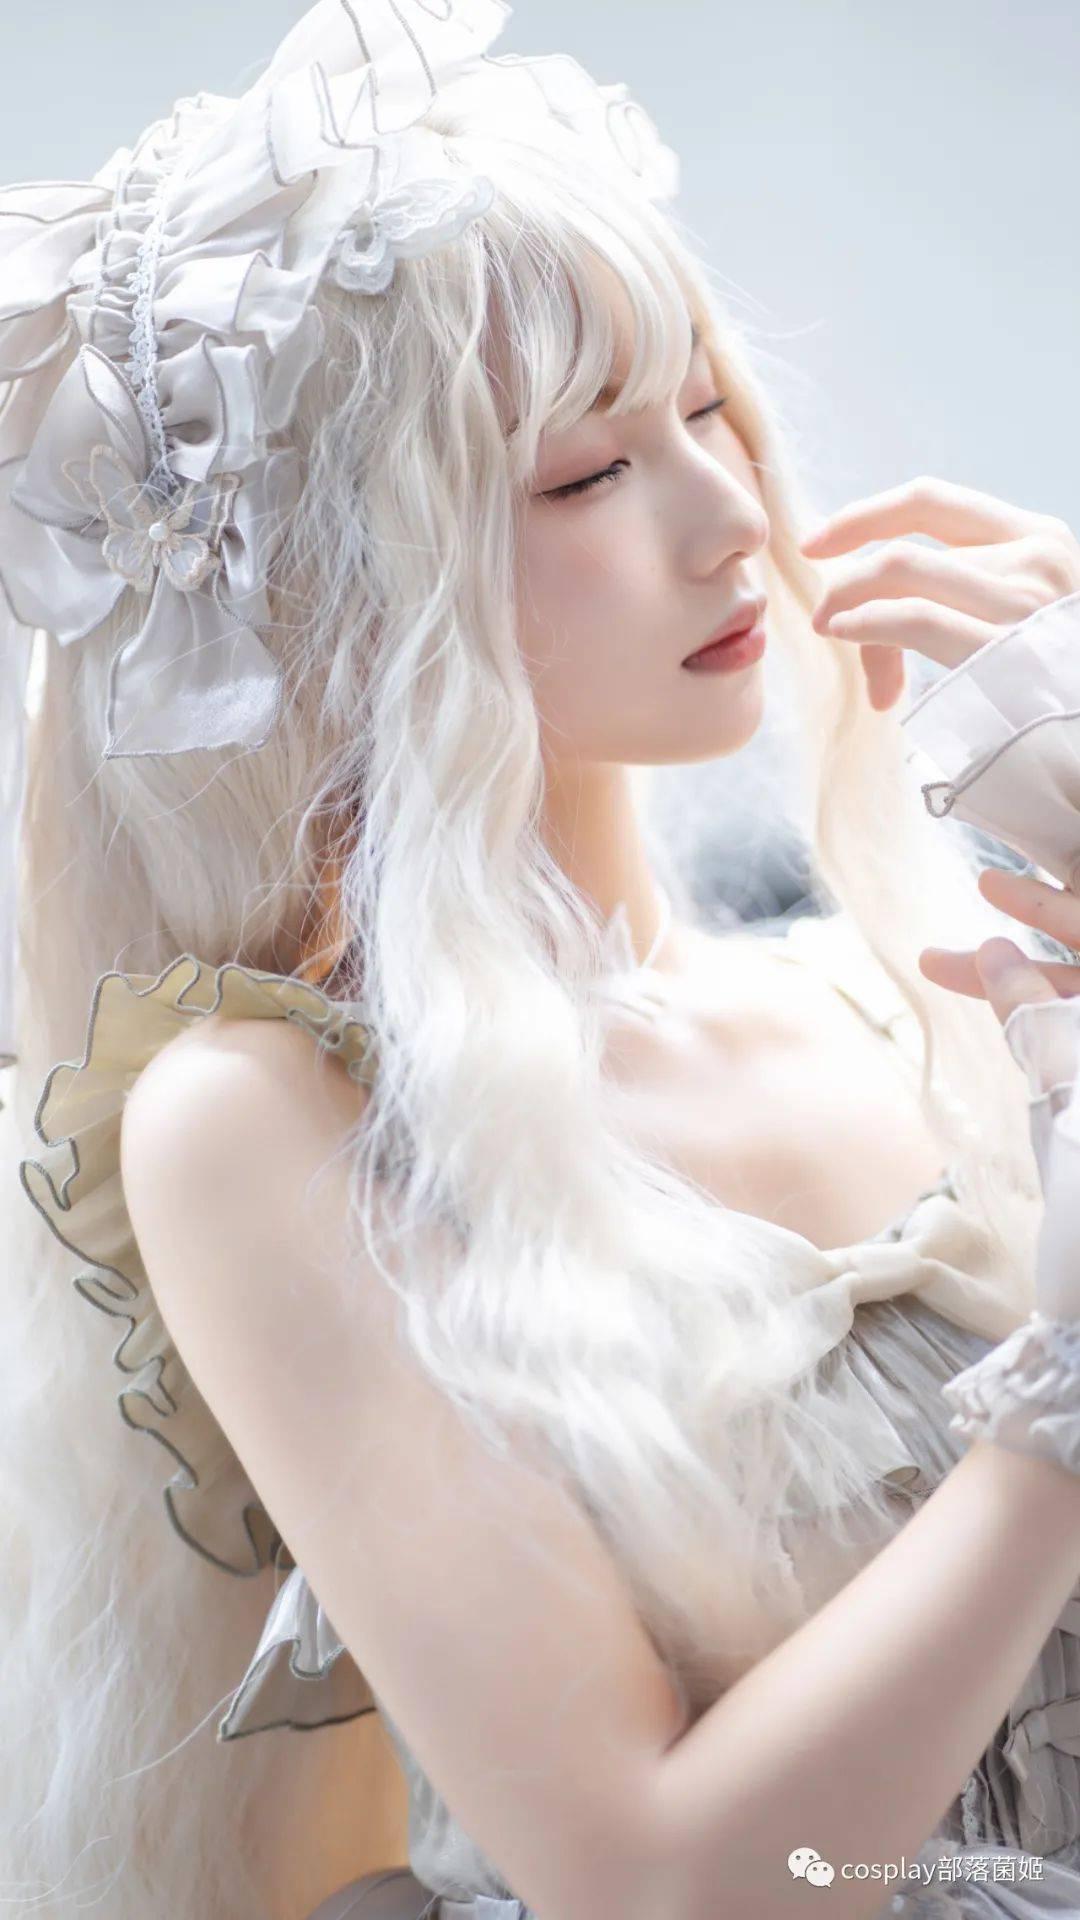 Lolita:唯美亮丽的小公主橙喵,你是梦中的天使嘛